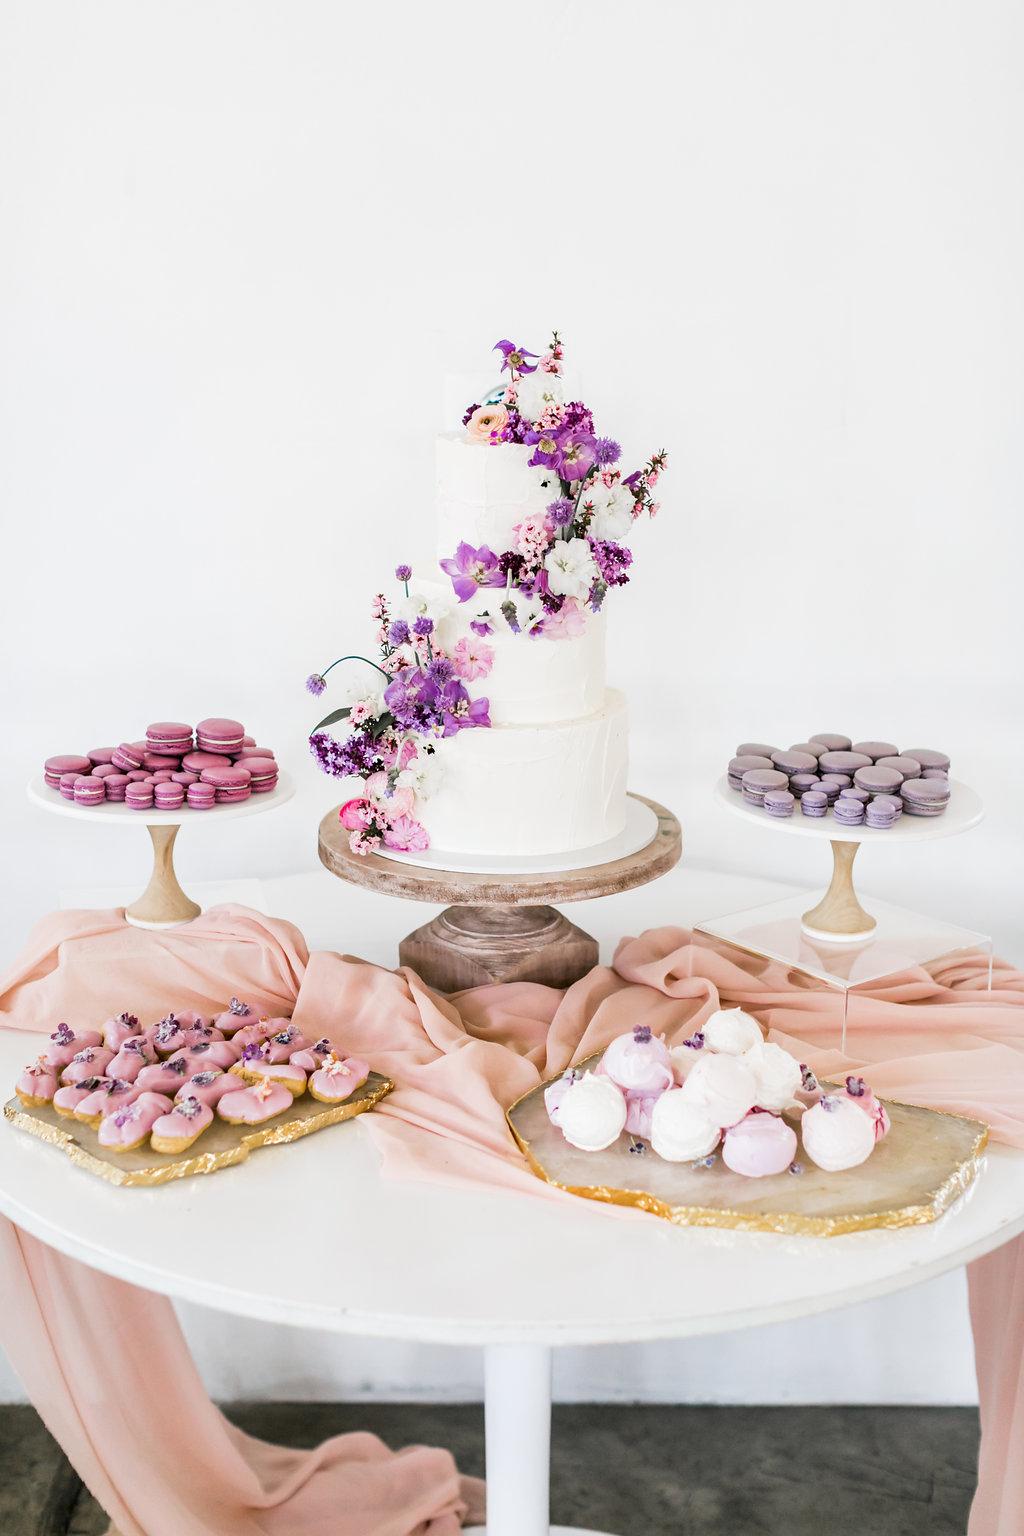 FloralBrickWeddingEditorial-NatalieSchuttPhotography-230 copy.JPG